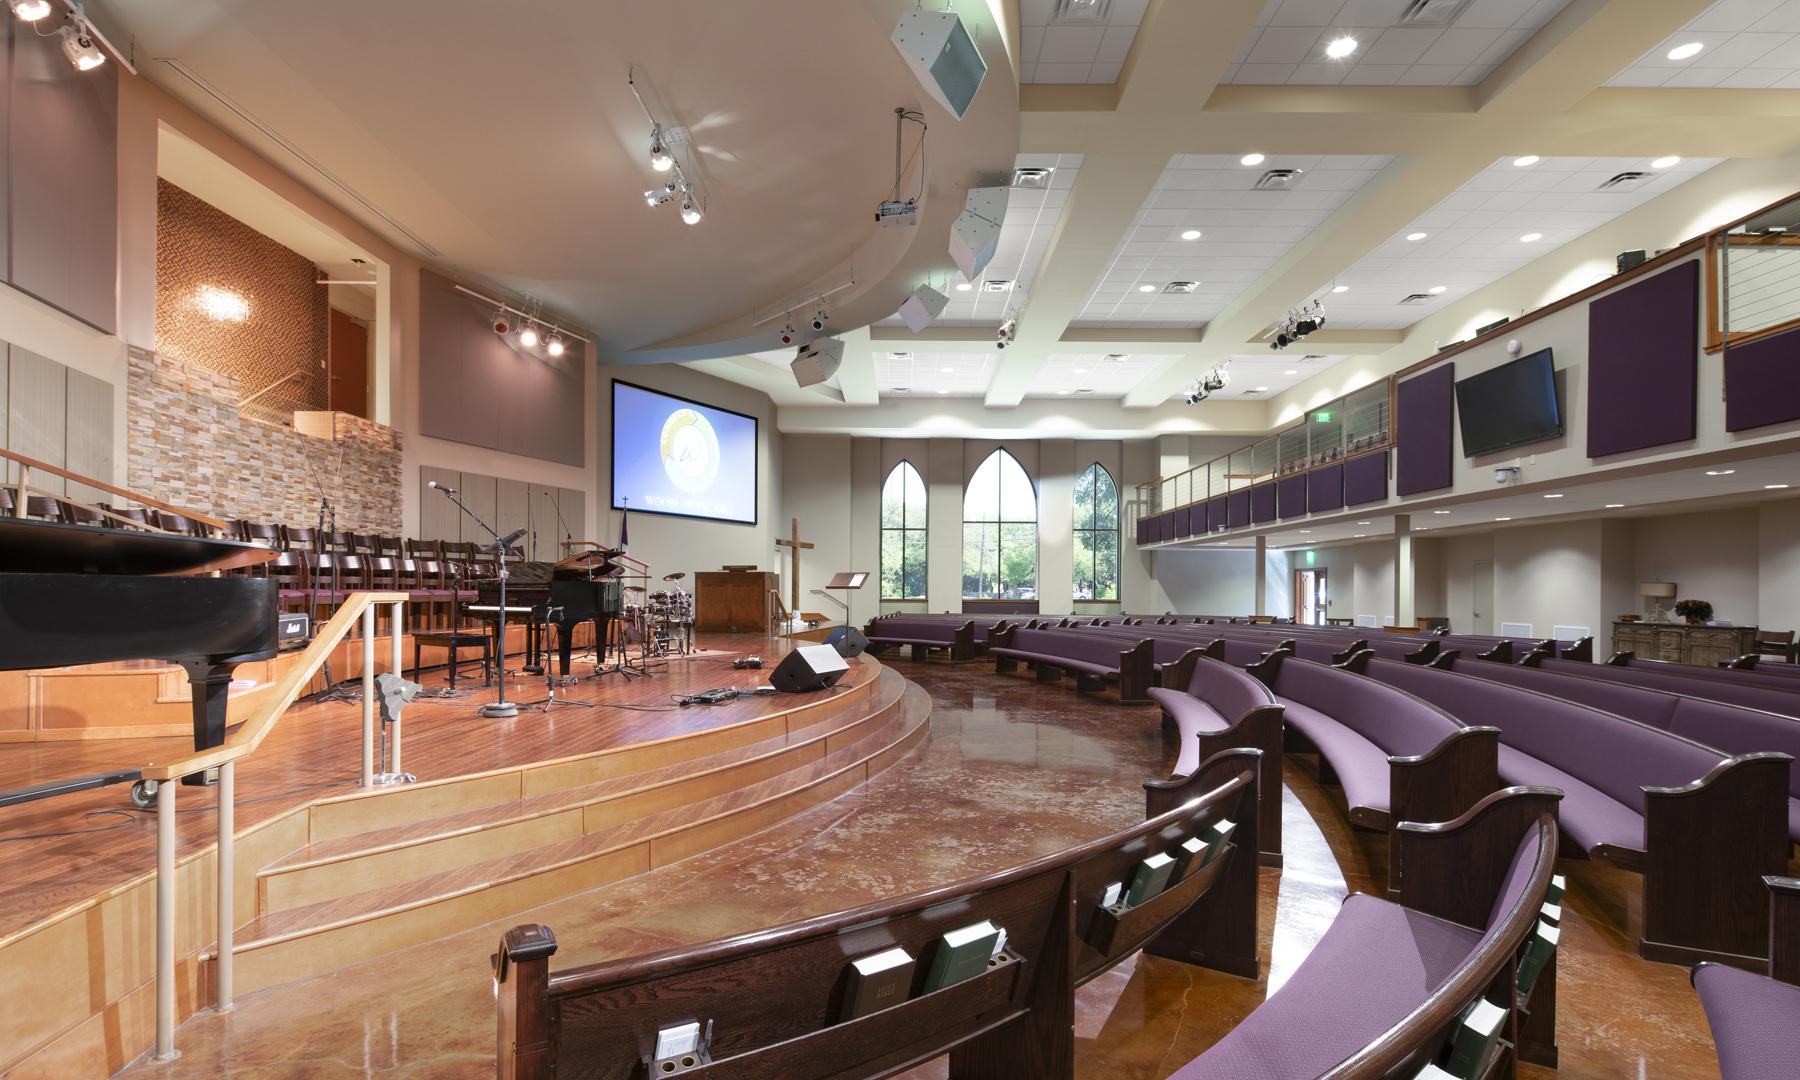 Woodlawn Baptist Church Sanctuary Interior Side View, Austin, TX, Heimsath Architects Church Design Specialists